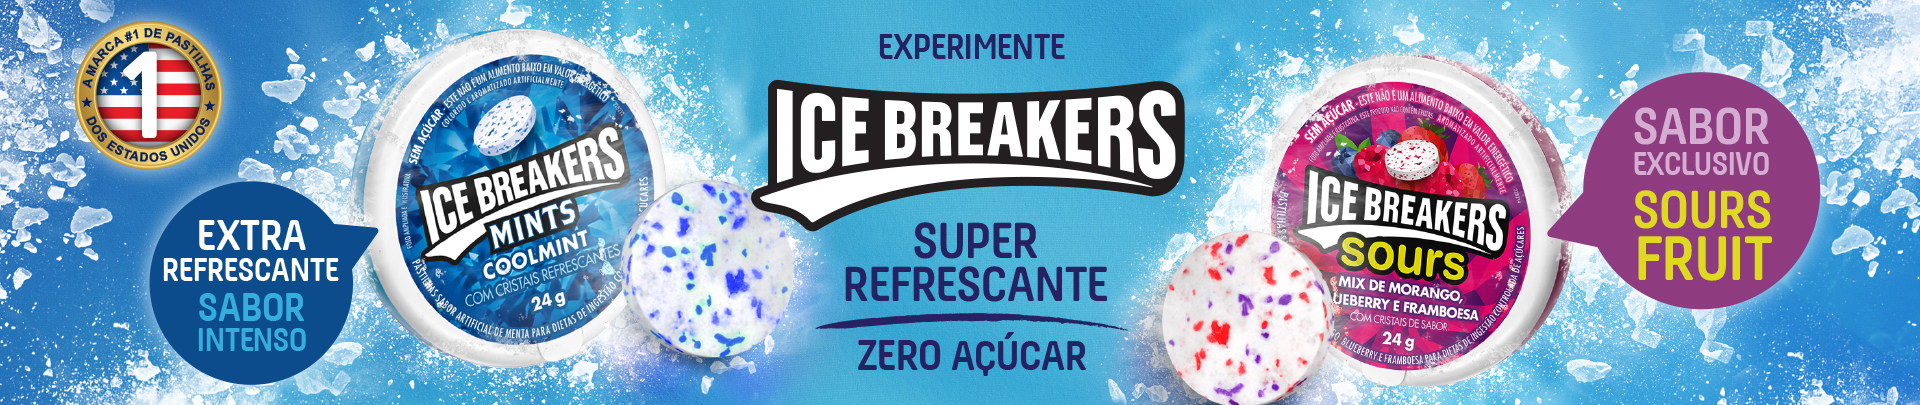 IceBreakers_Abril2021